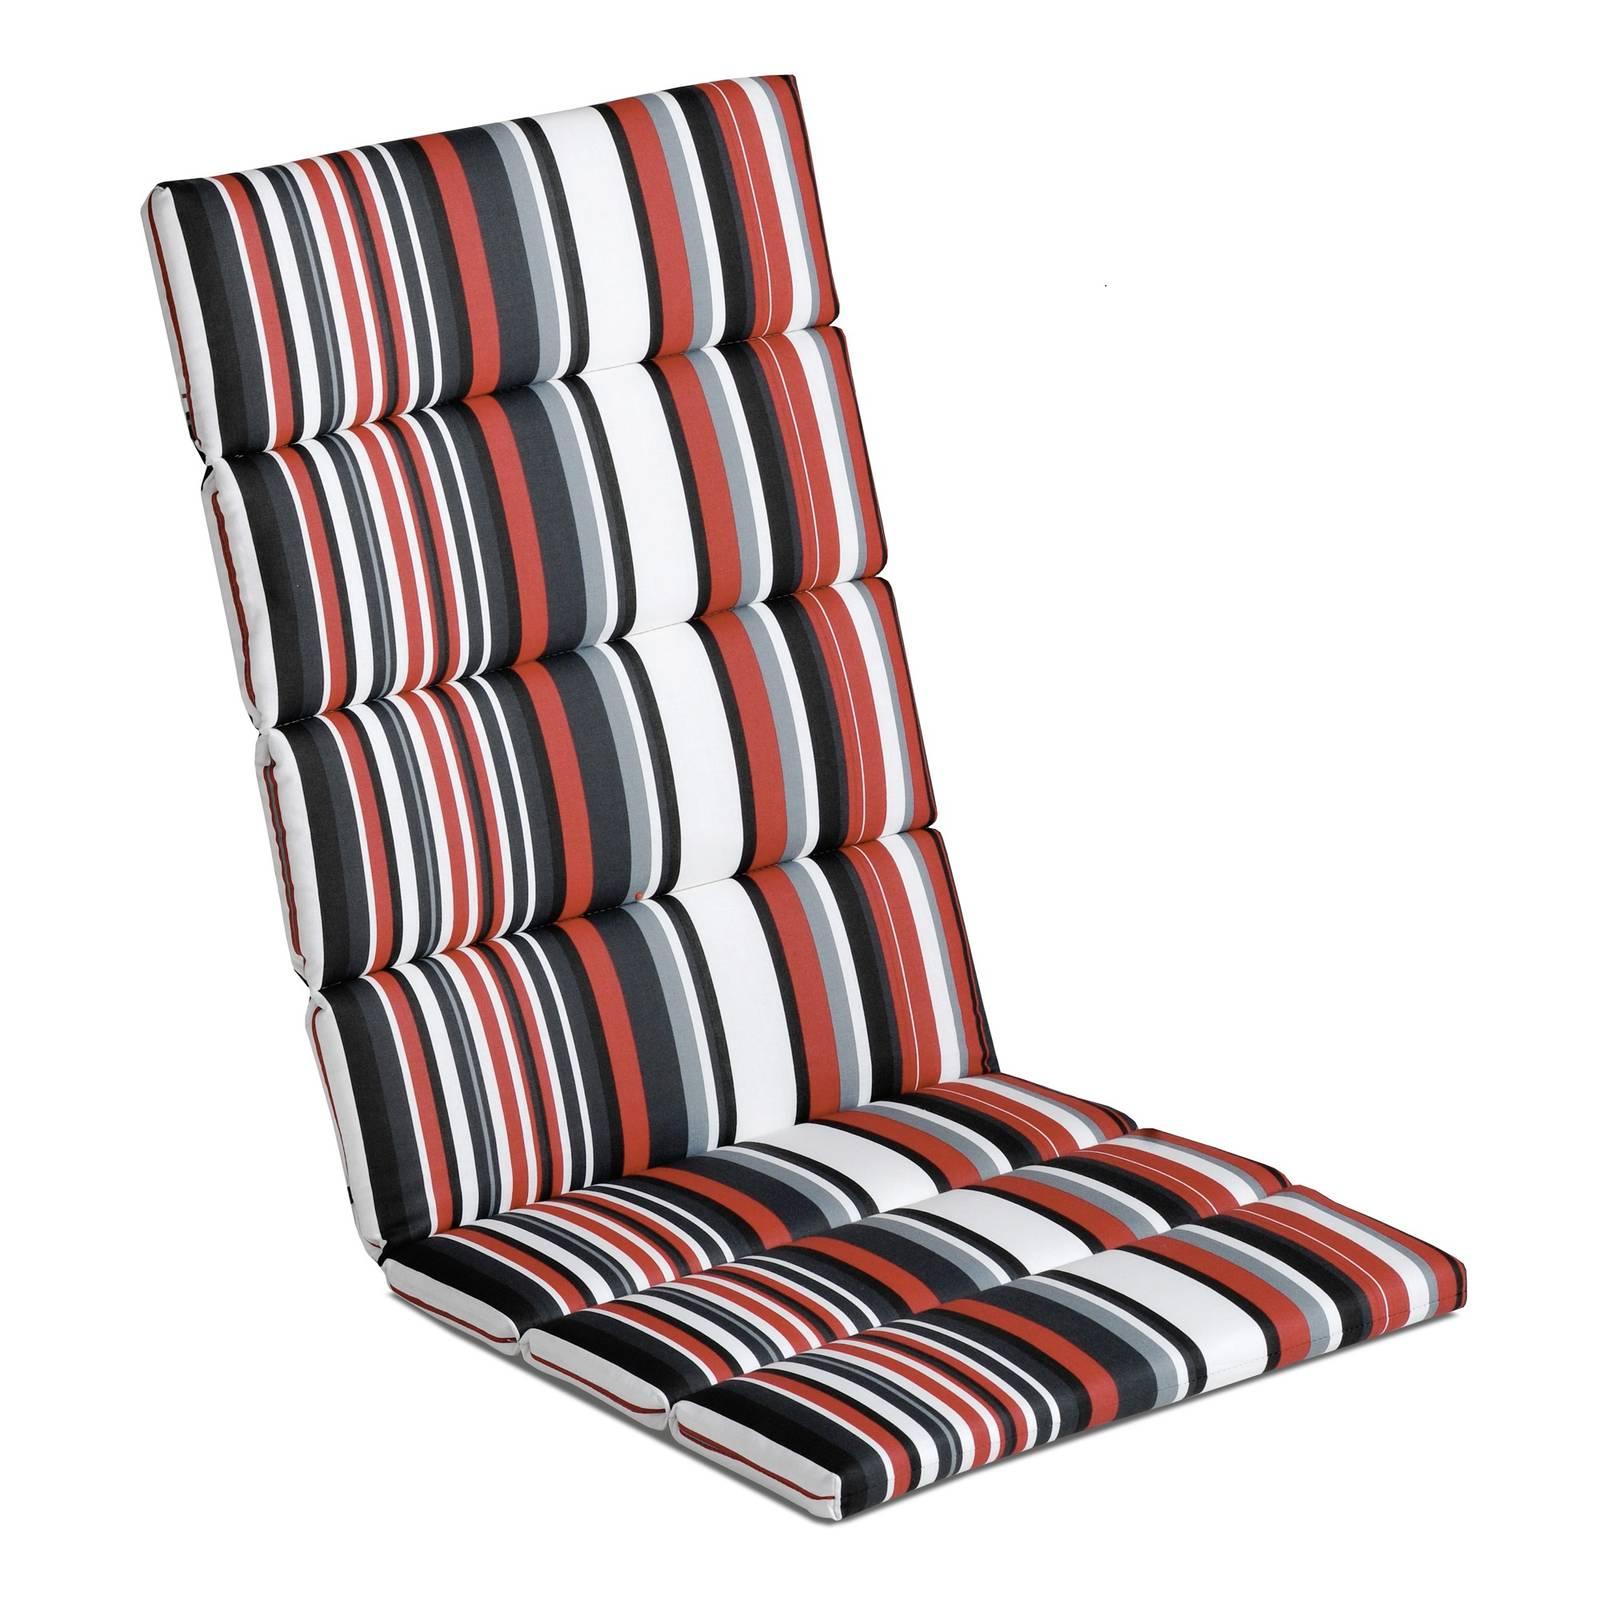 Poduszka na fotel Madera Hoch 5 cm C001-03PB PATIO